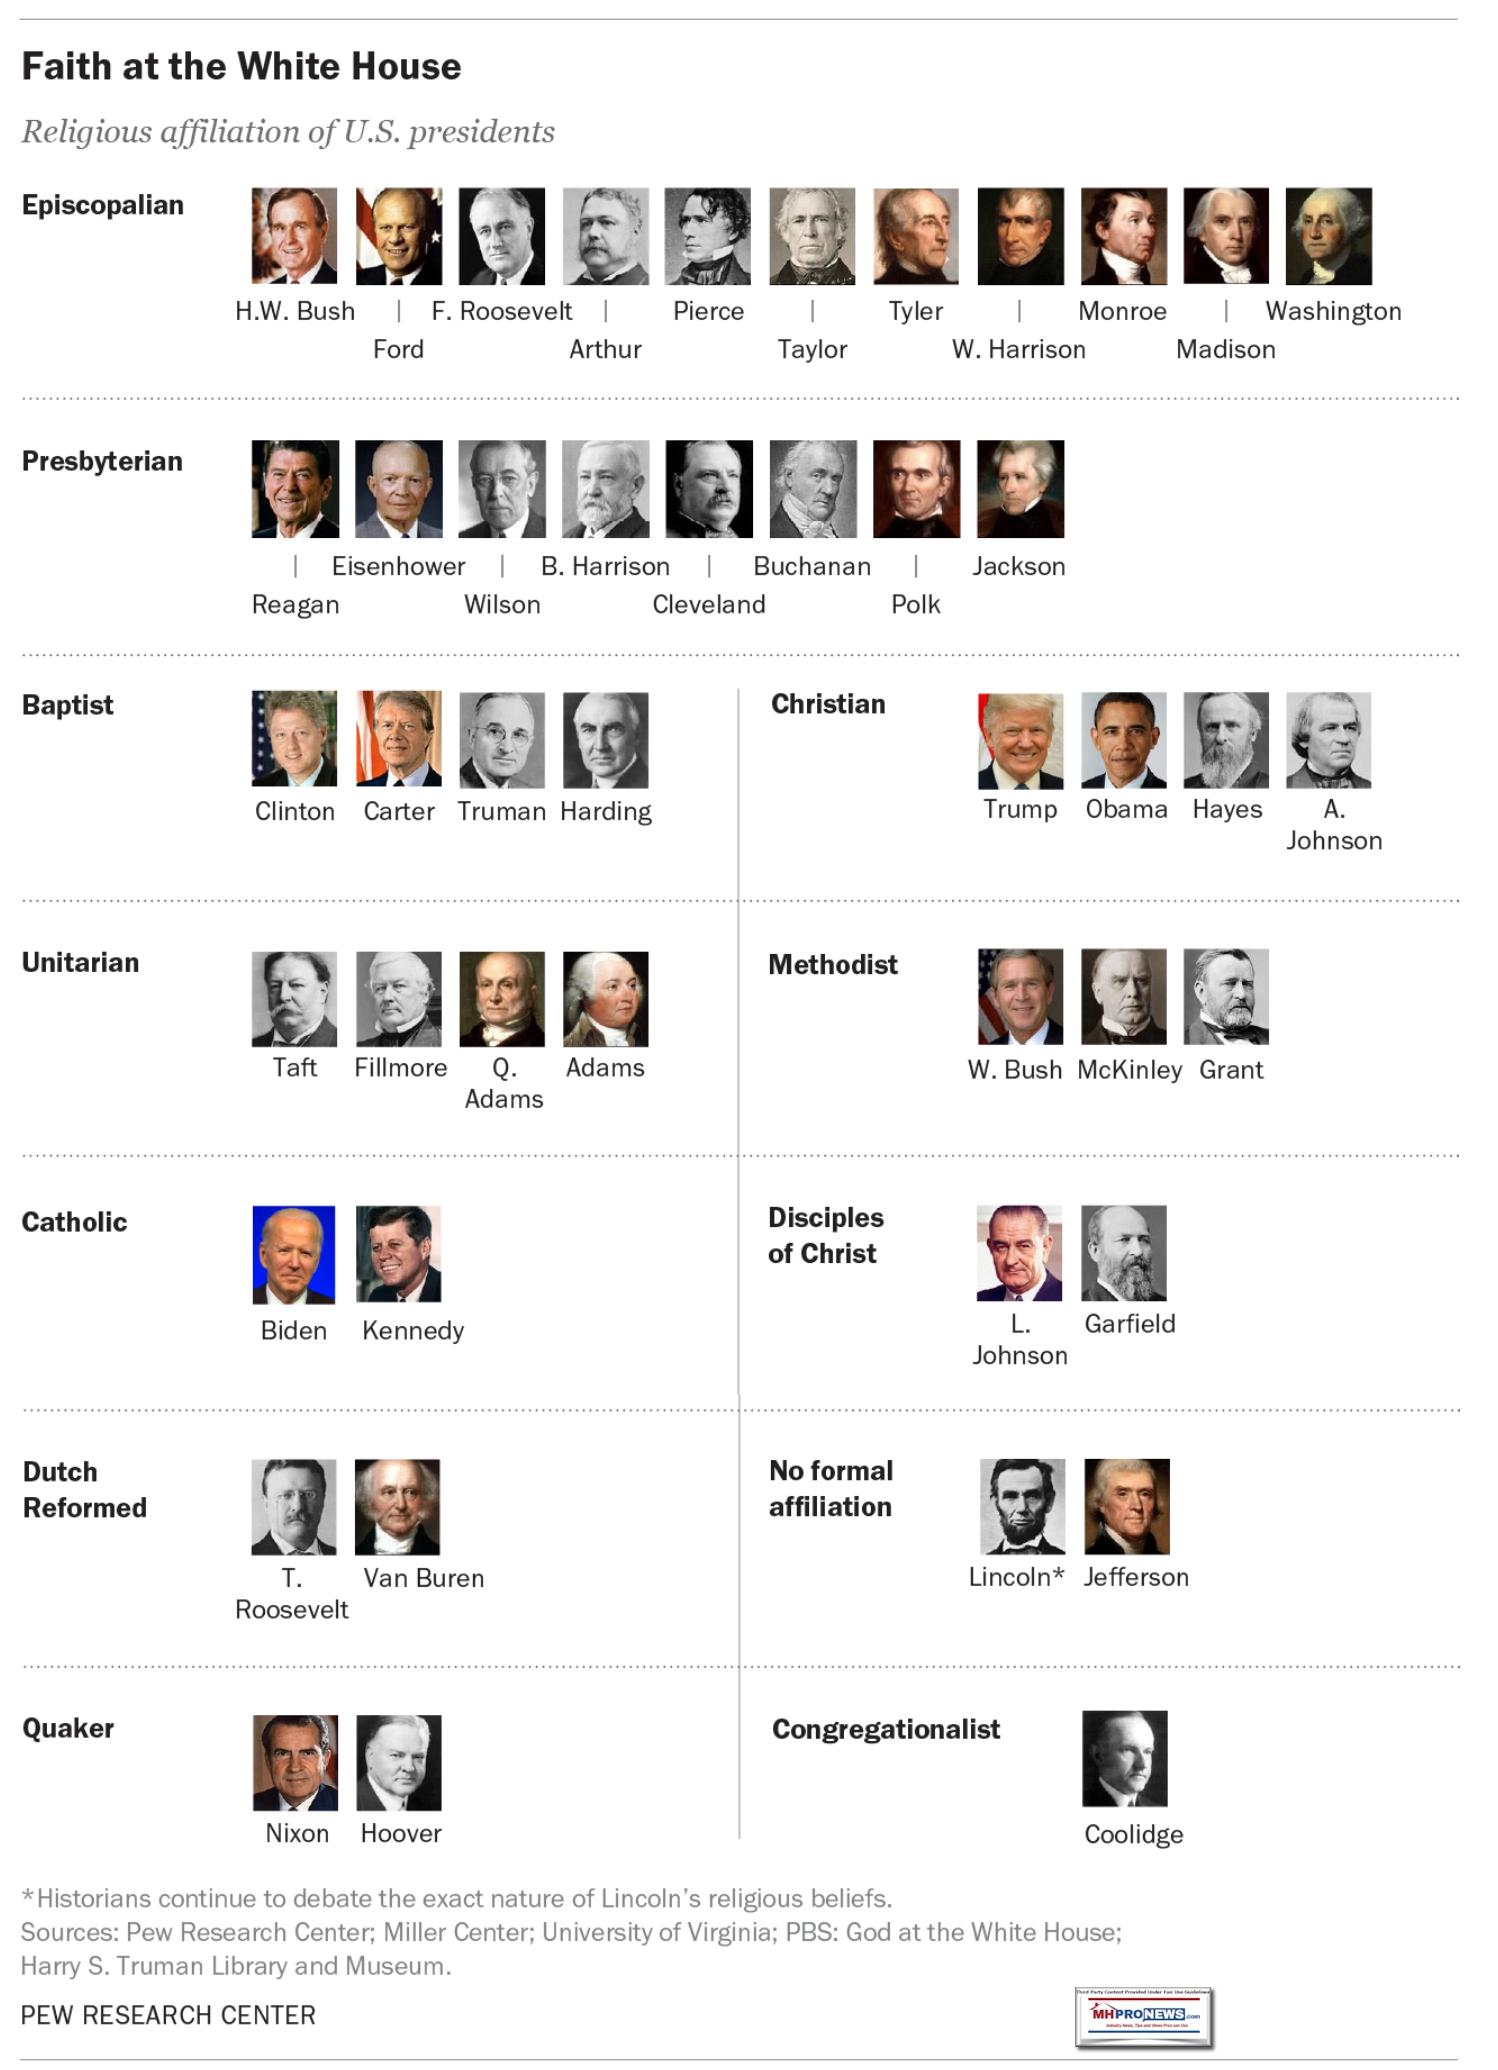 PewResearchPresidentialFaith-DenominationReligiousChurchAffiliationFaithOfAllU.S.PresidentsMHProNews